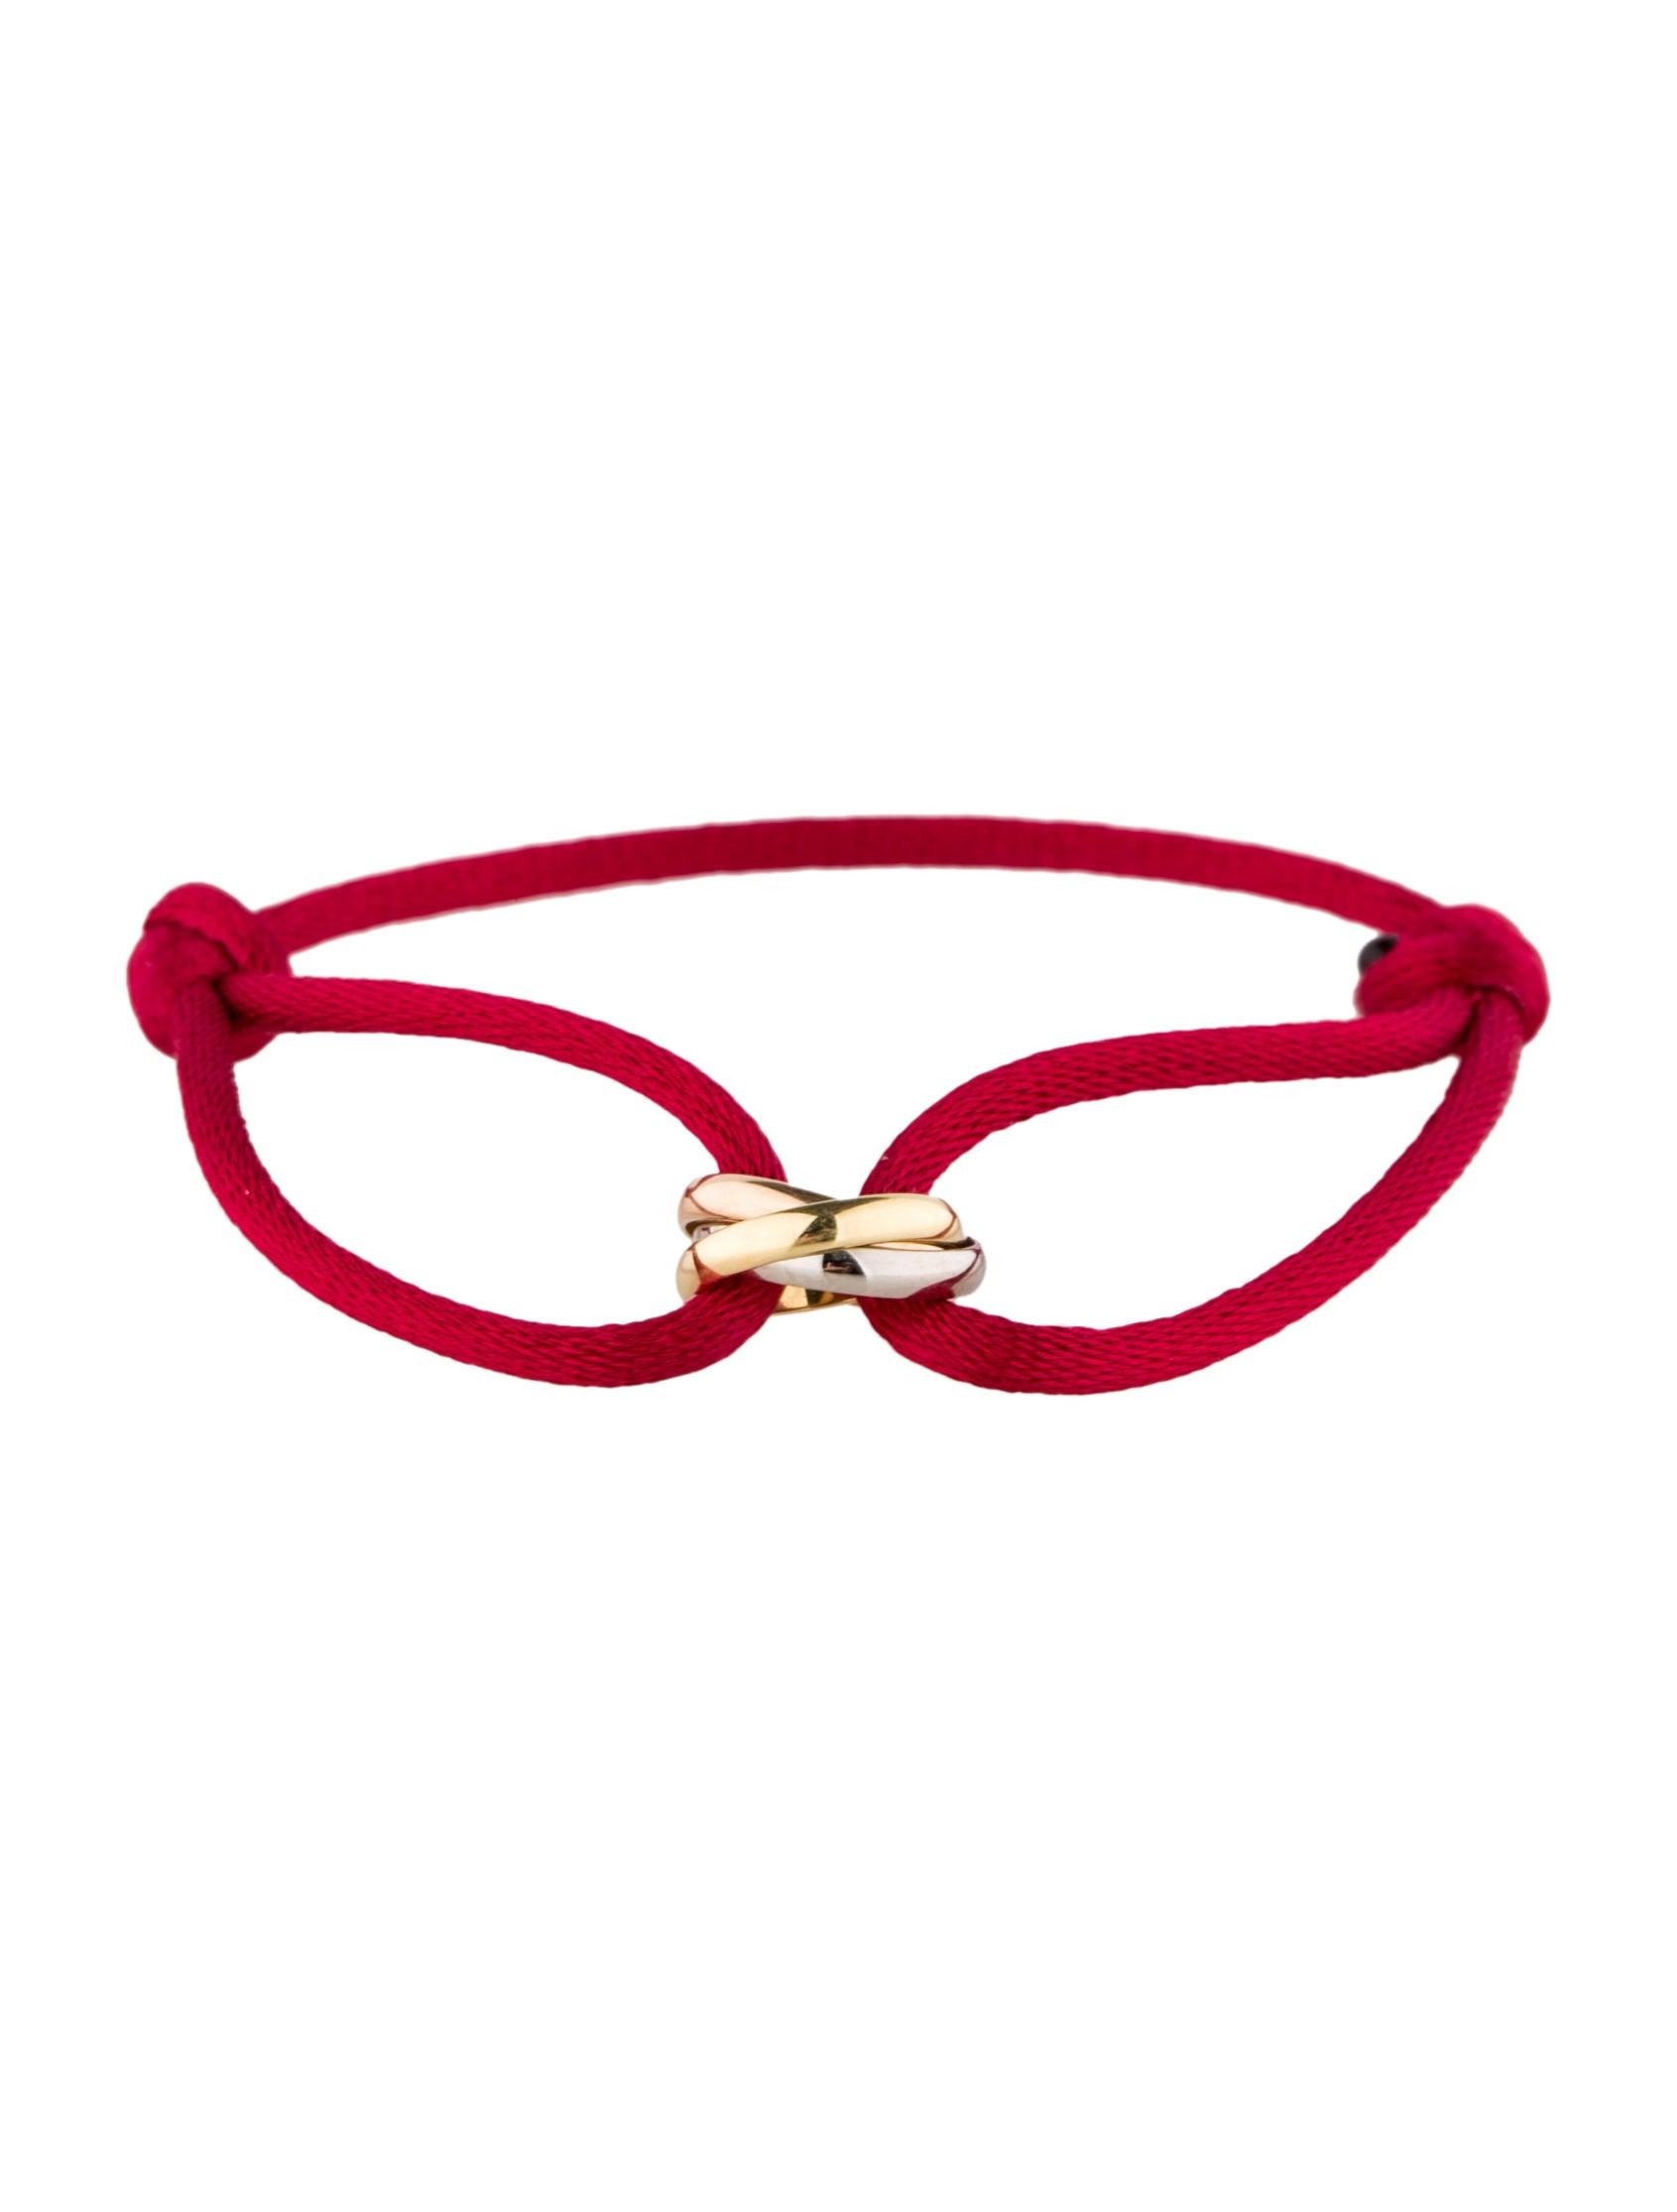 Trinity Cord Bracelet